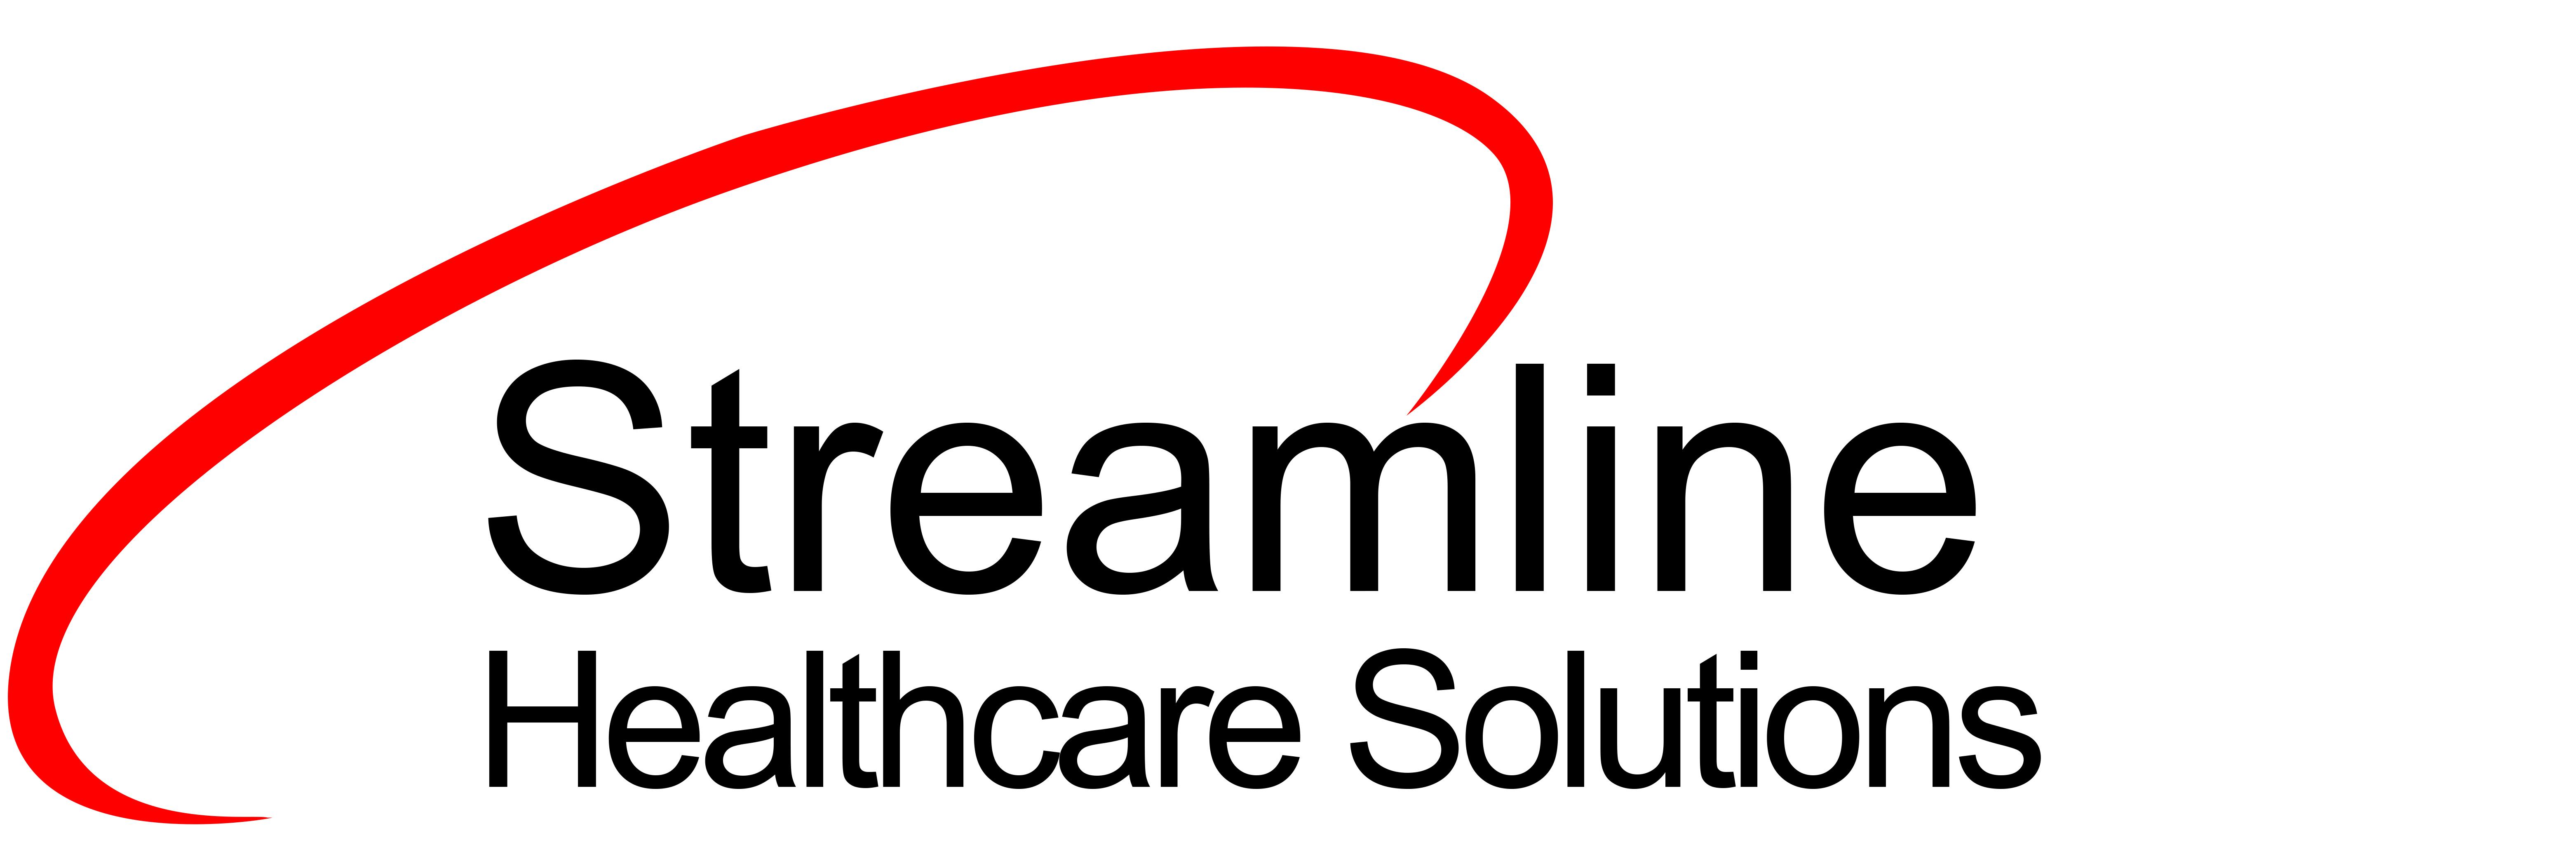 Streamline Healthcare Solutions